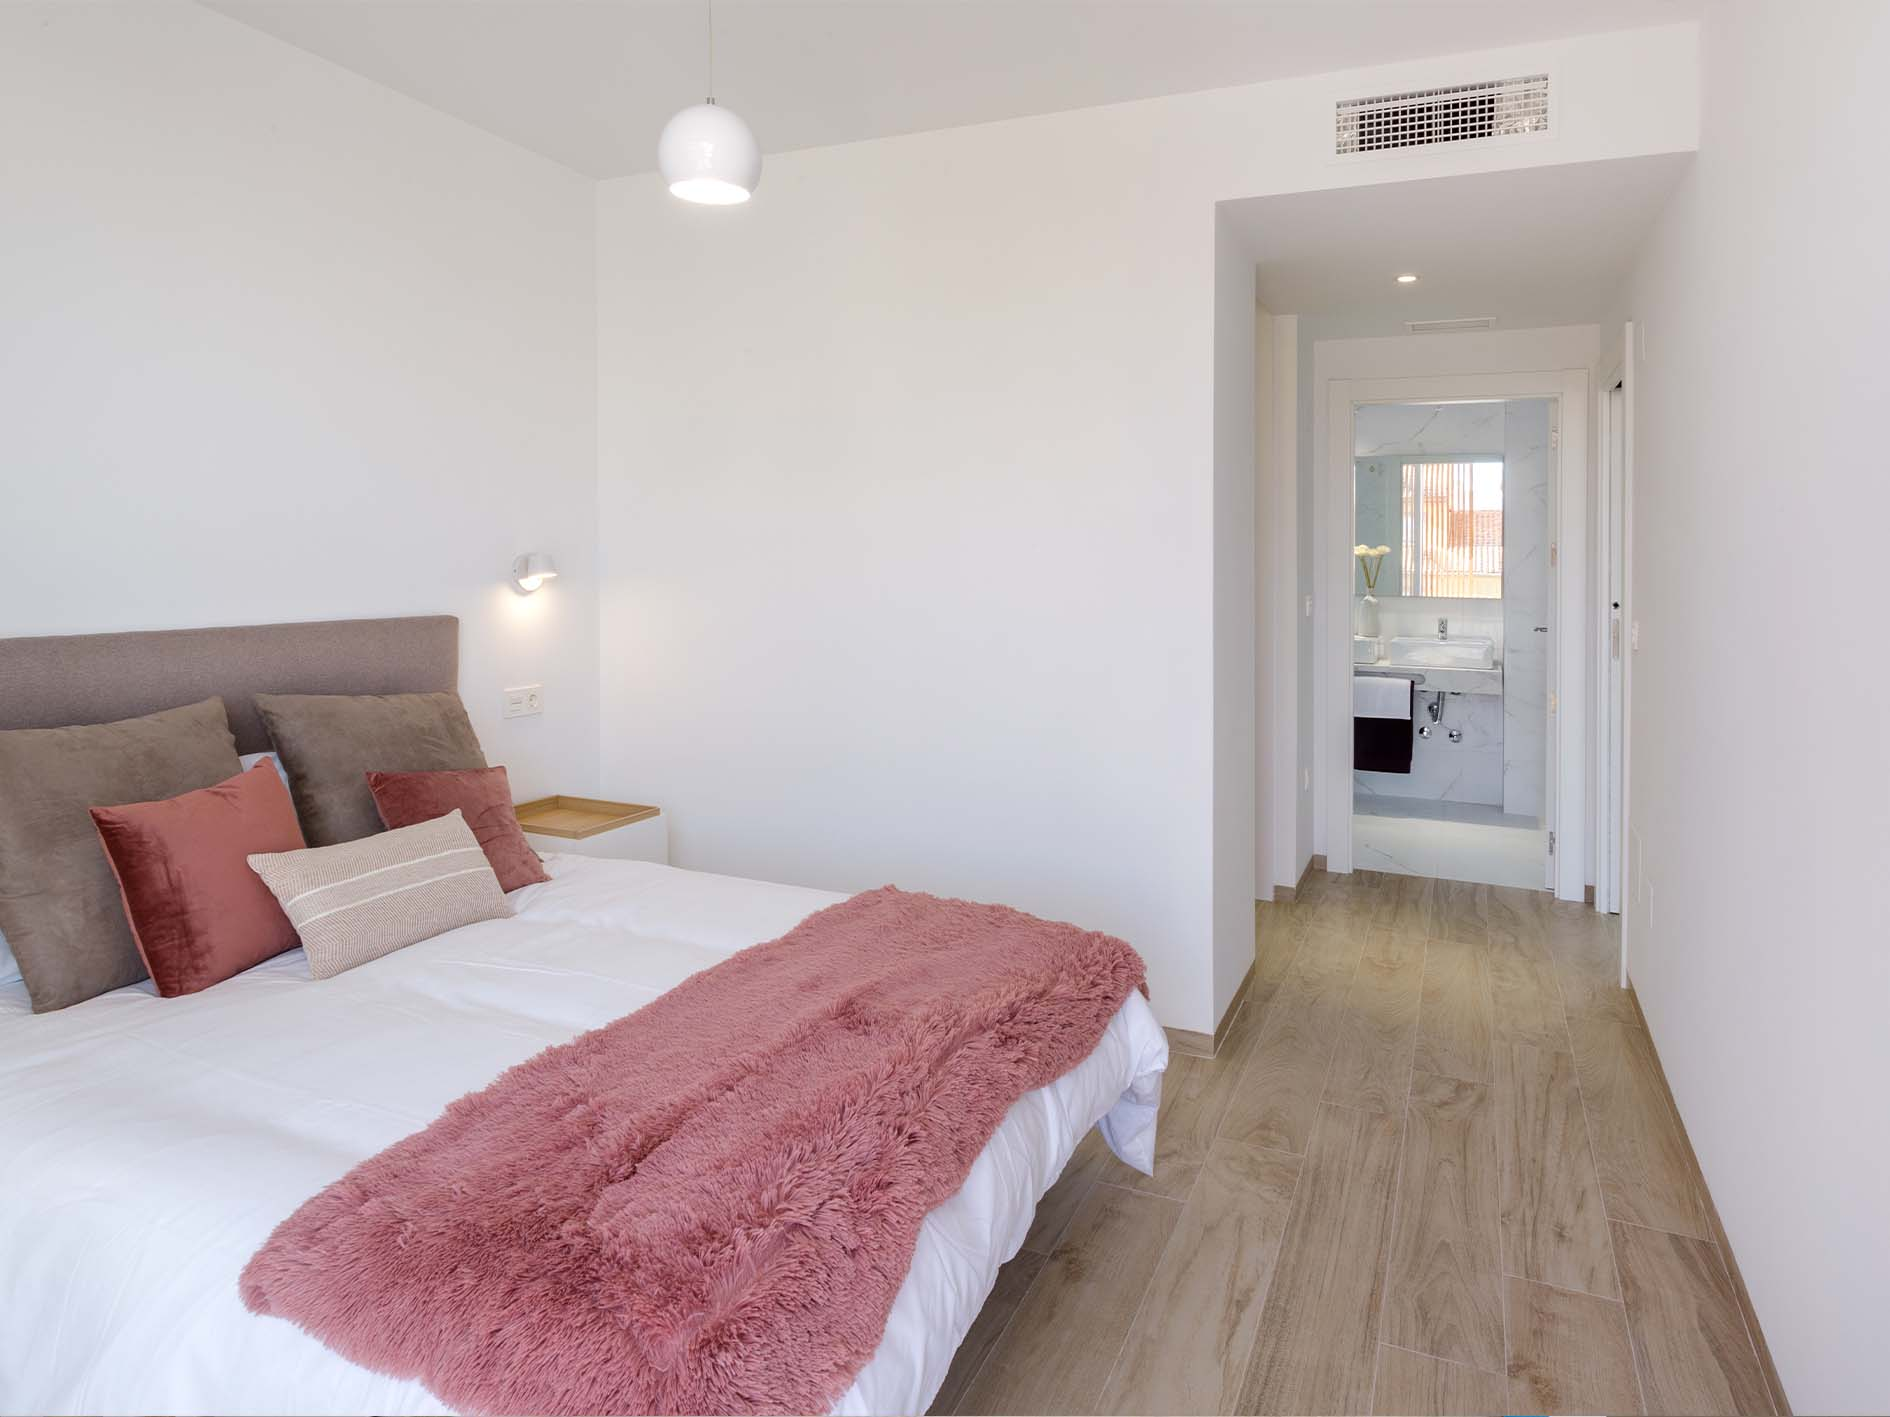 immobilier neuf espagne costa blanca on-d9 el farallon chambre 2 sdb